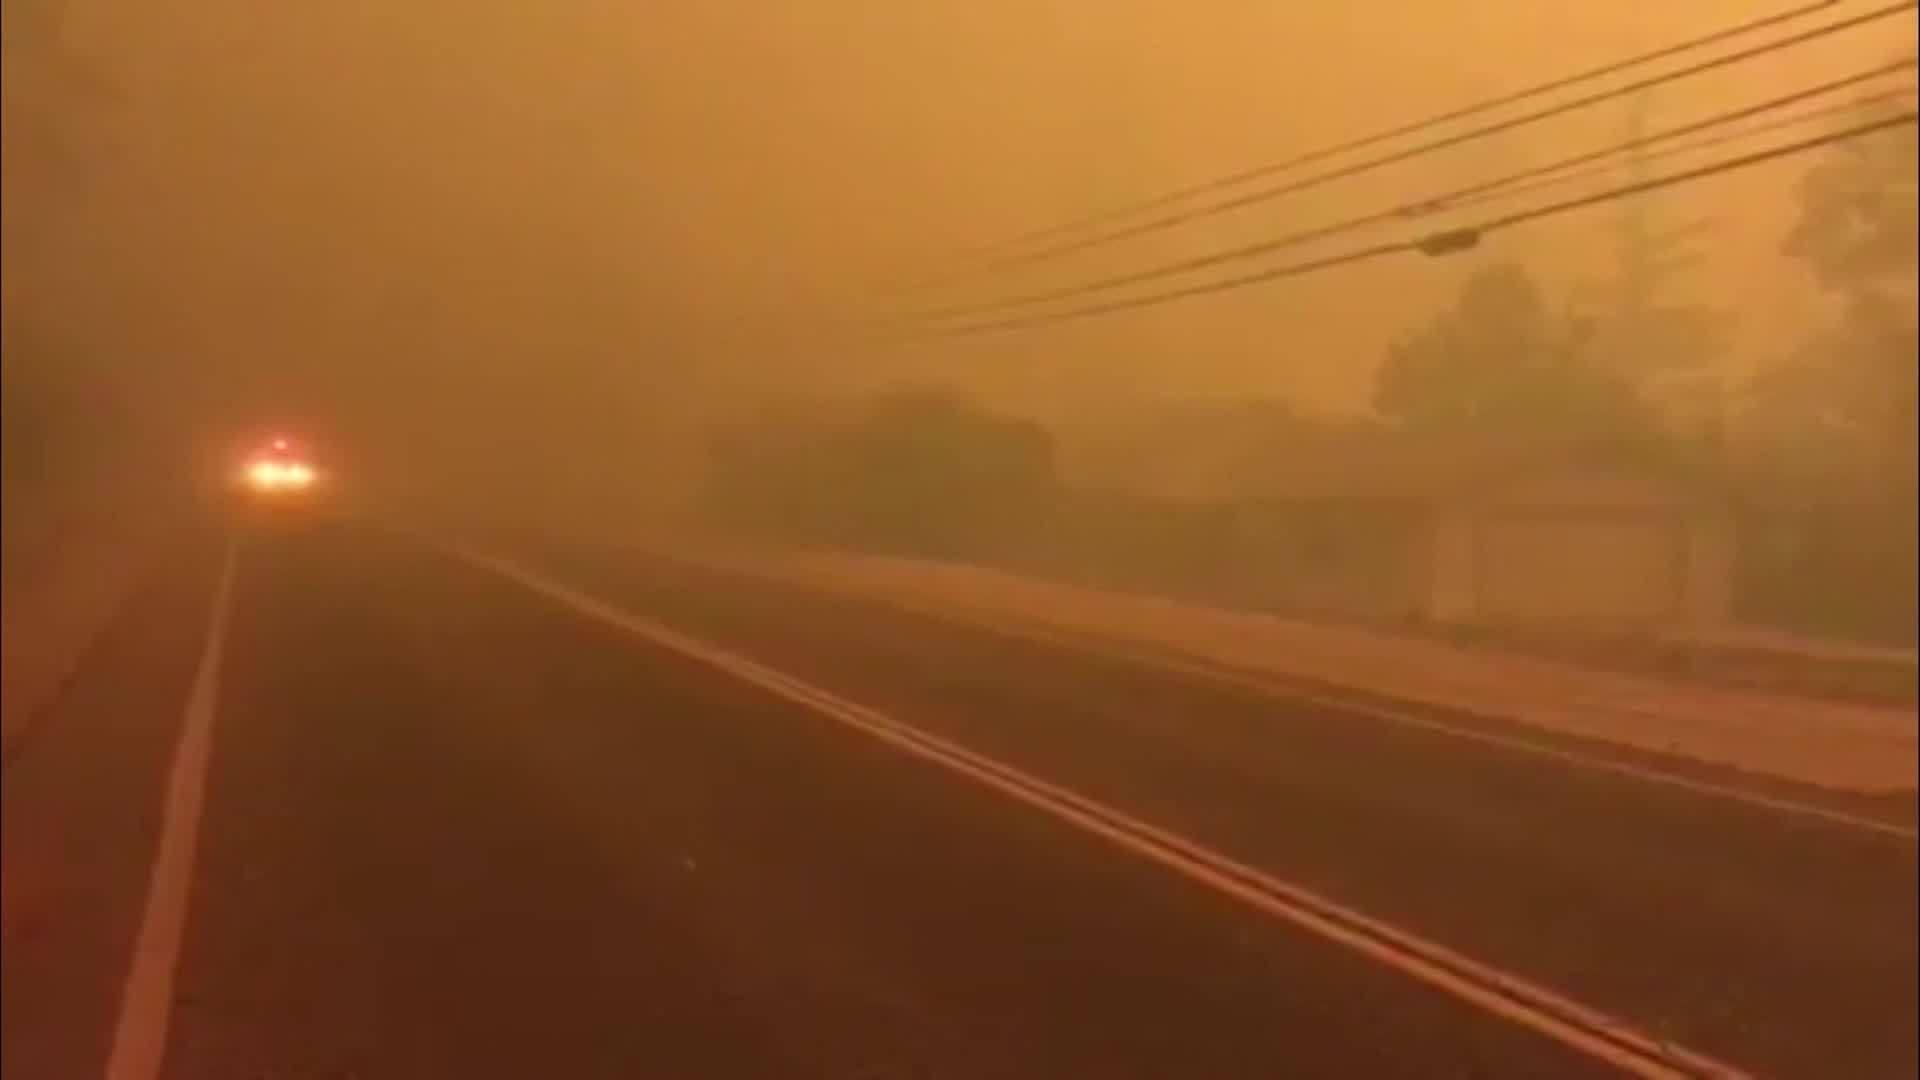 Orange_glowing_smoke_for_Camp_Fire_as_re_0_20181108221912